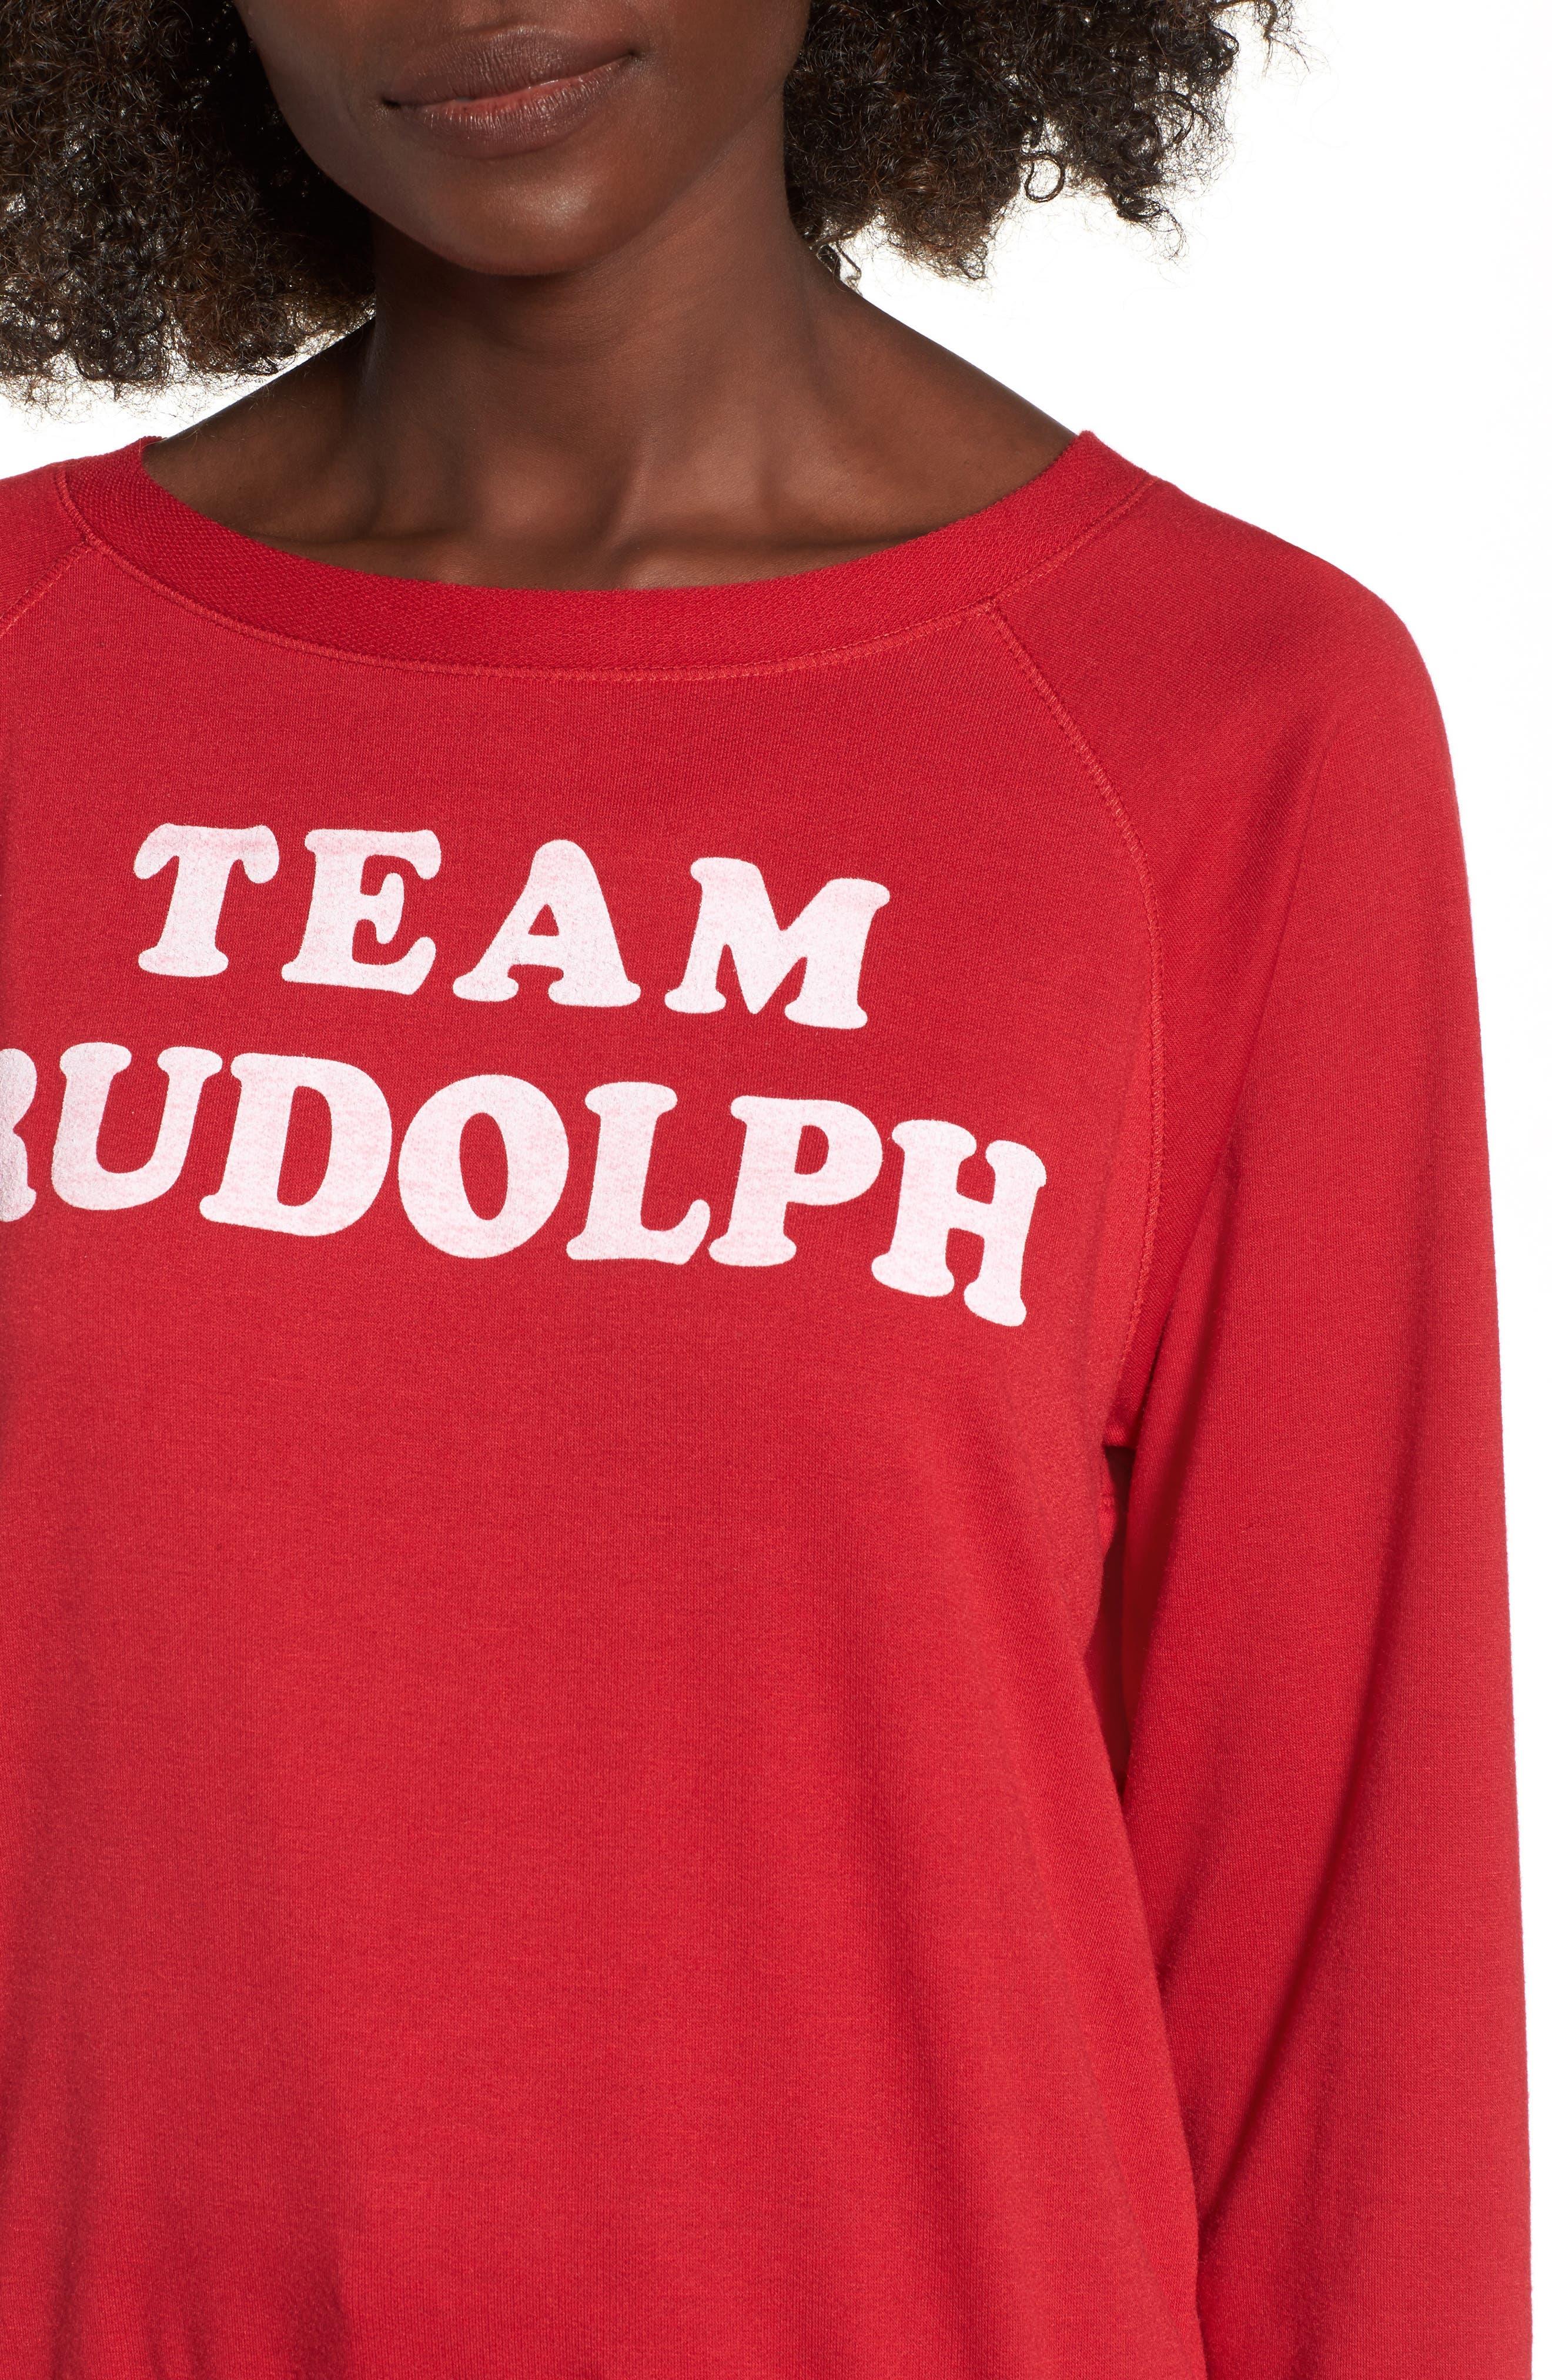 Team Rudolph Sweatshirt,                             Alternate thumbnail 4, color,